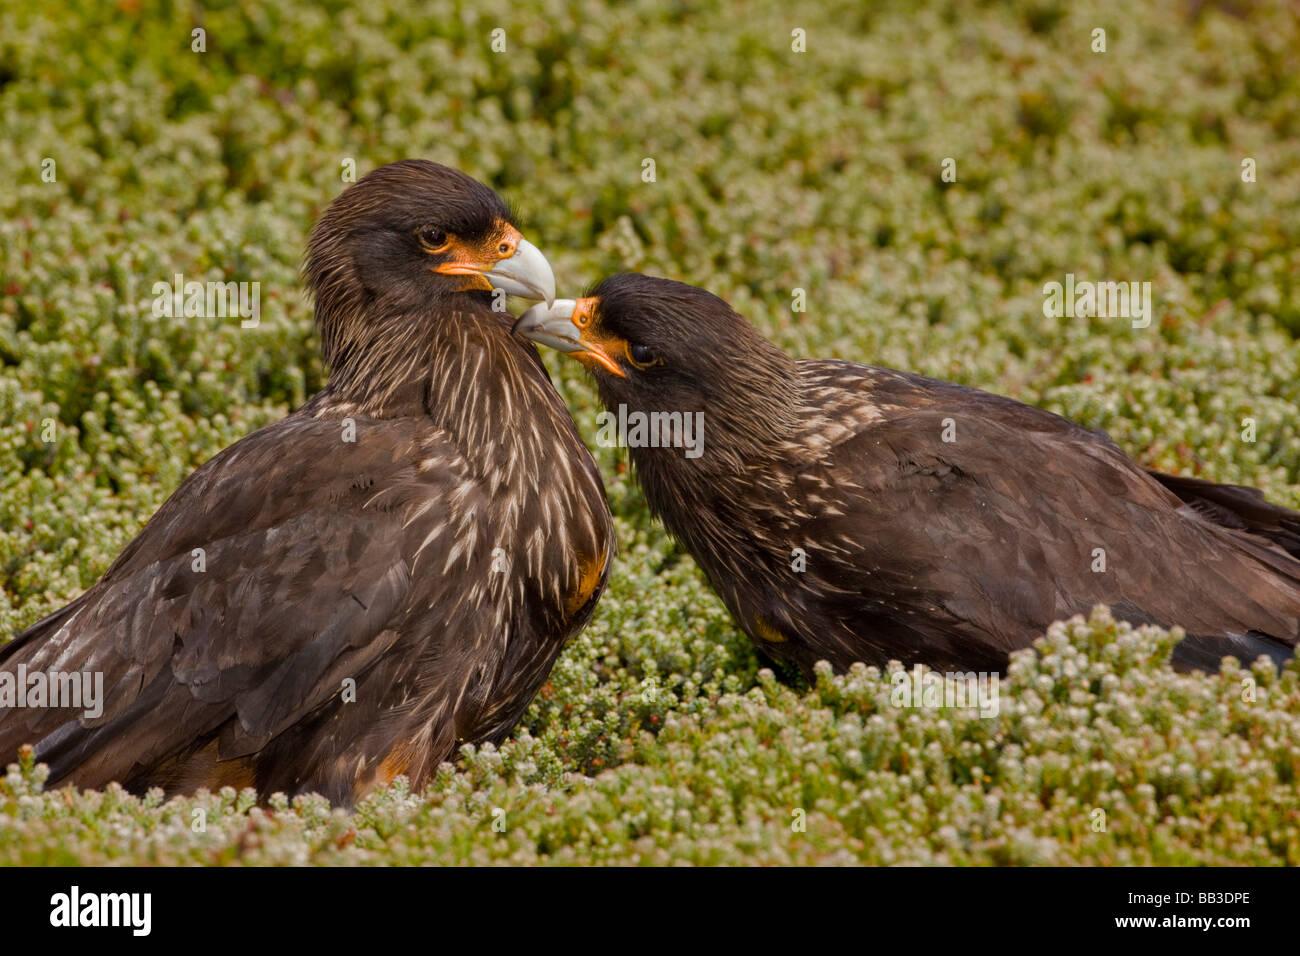 South Atlantic, Falkland Islands, West Point Island. Striated caracara preening mate. Stock Photo